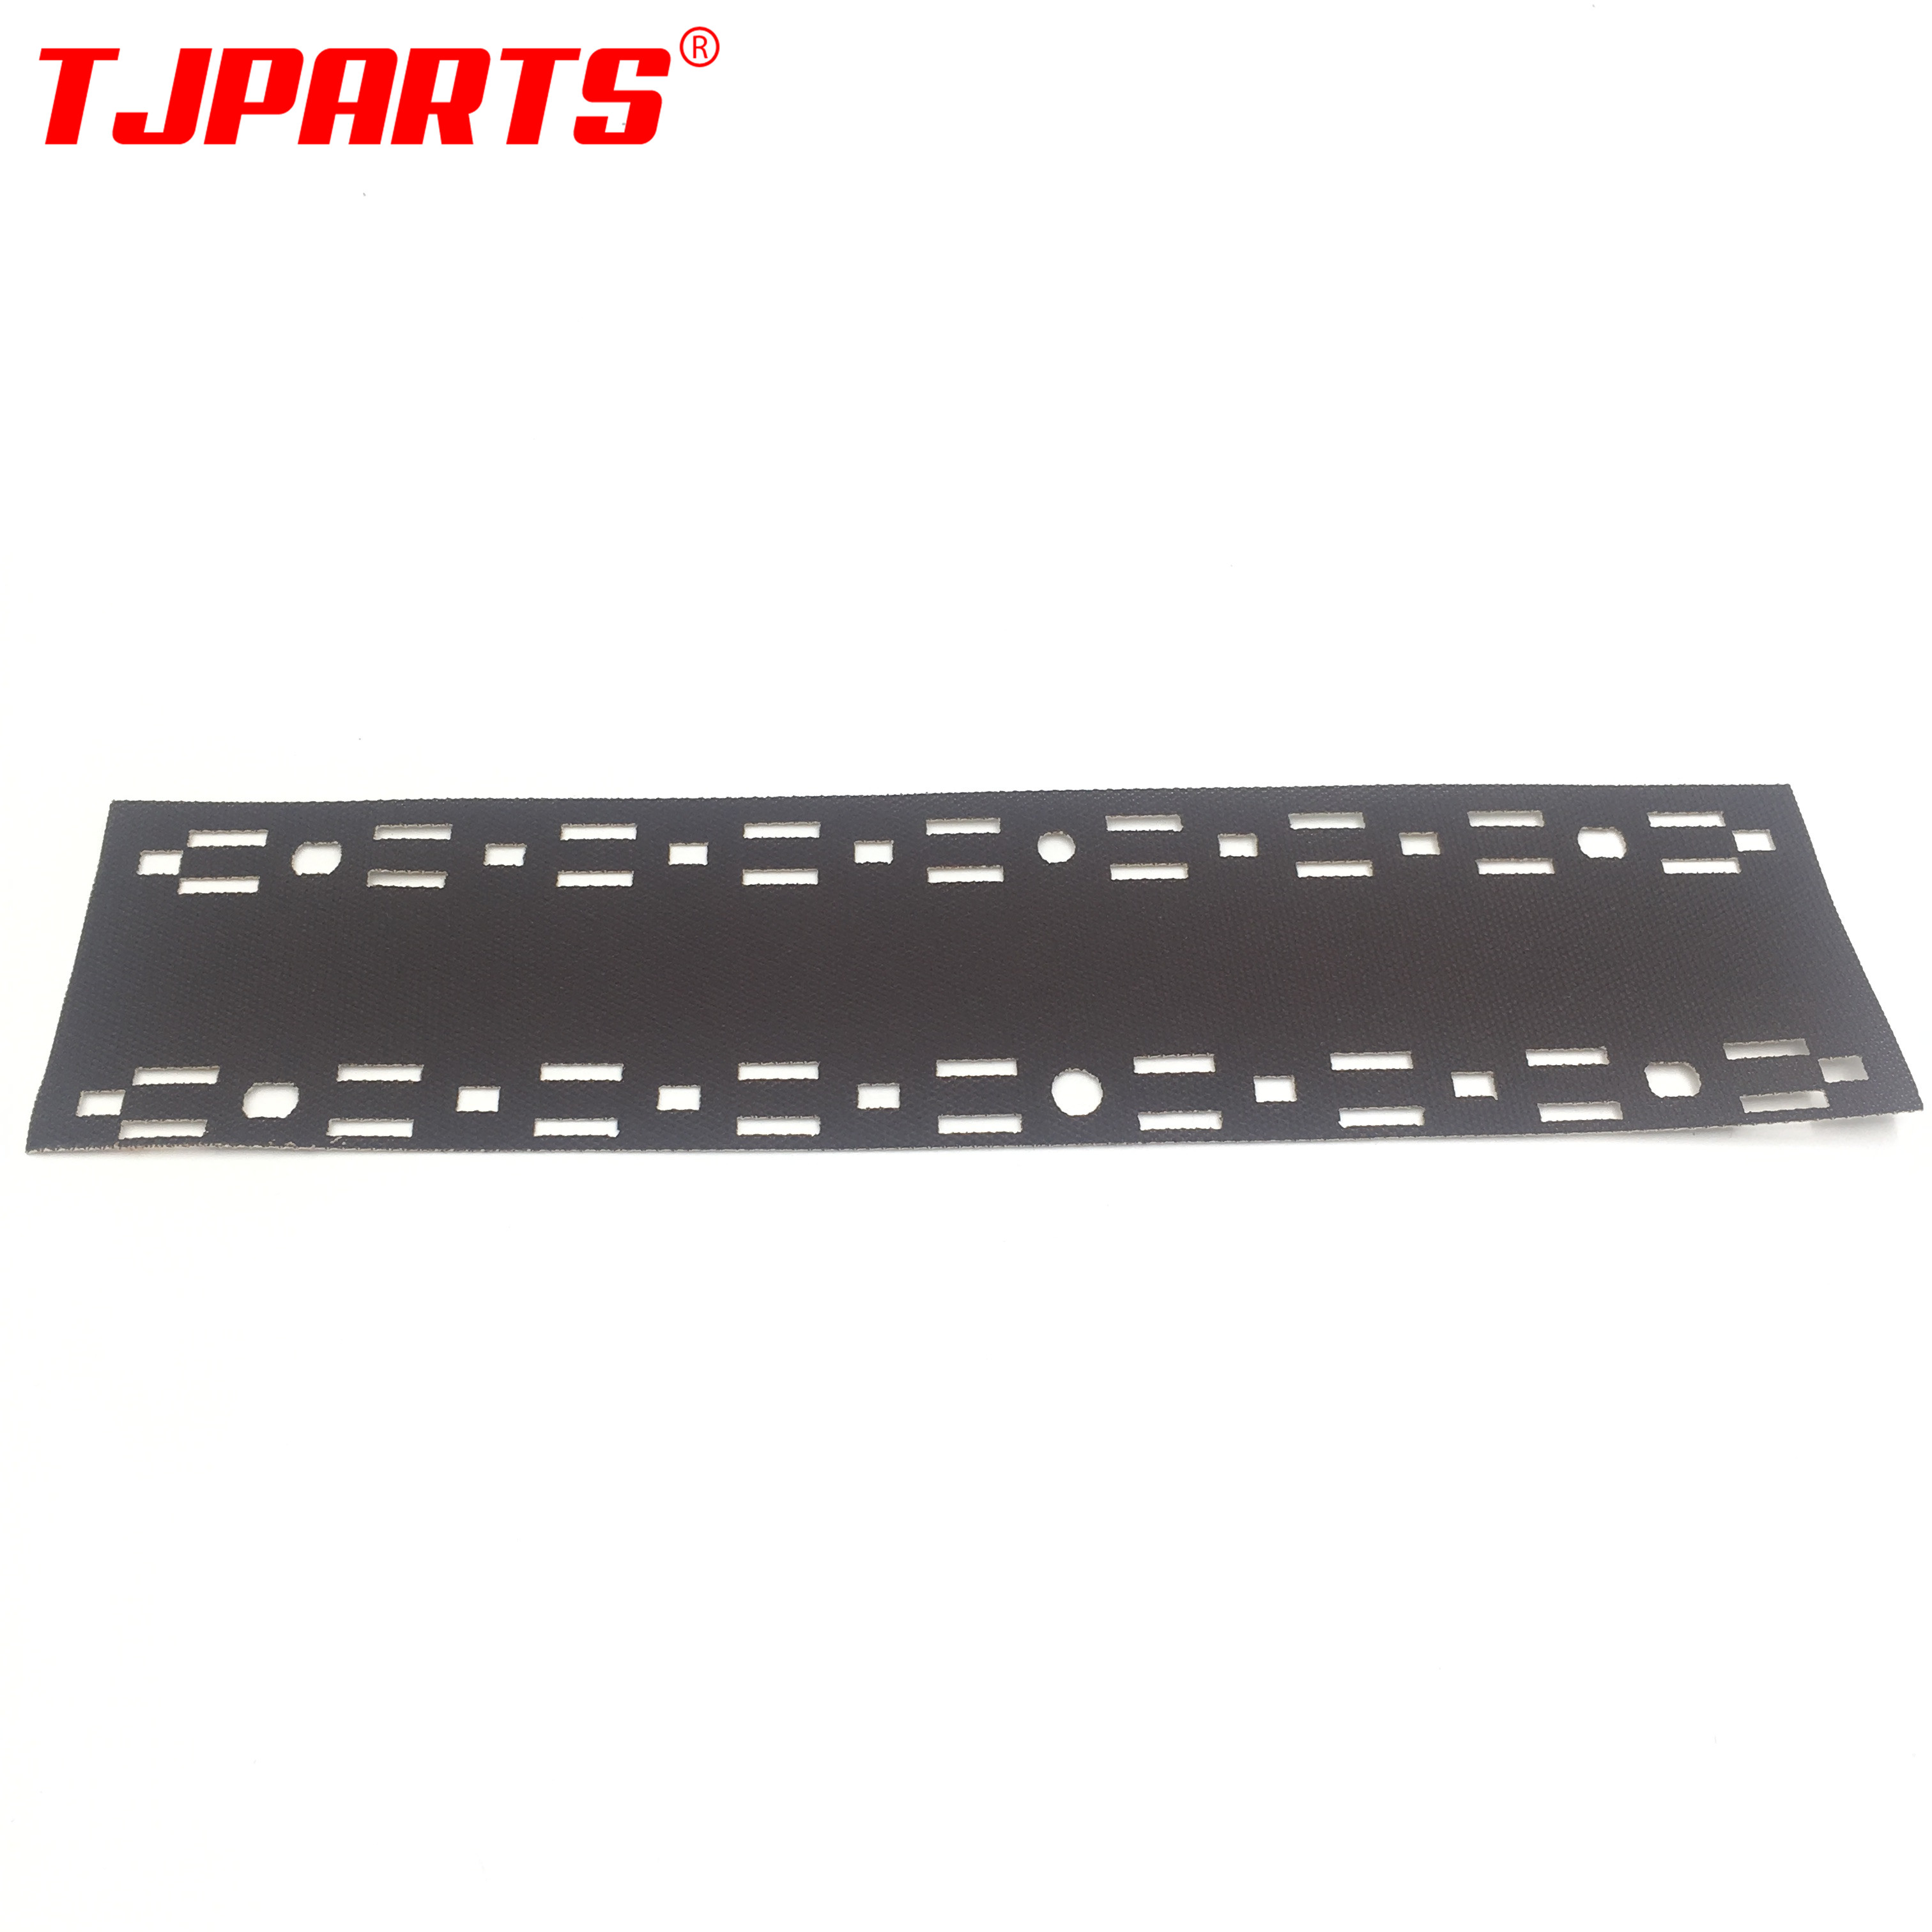 1PC X Fuser Heat Cloth Fabric Oil Application Pad W/O Holder For Kyocera P2040 P2235 P2335 M2040 M2135 M2235 M2540 M2635 M2640